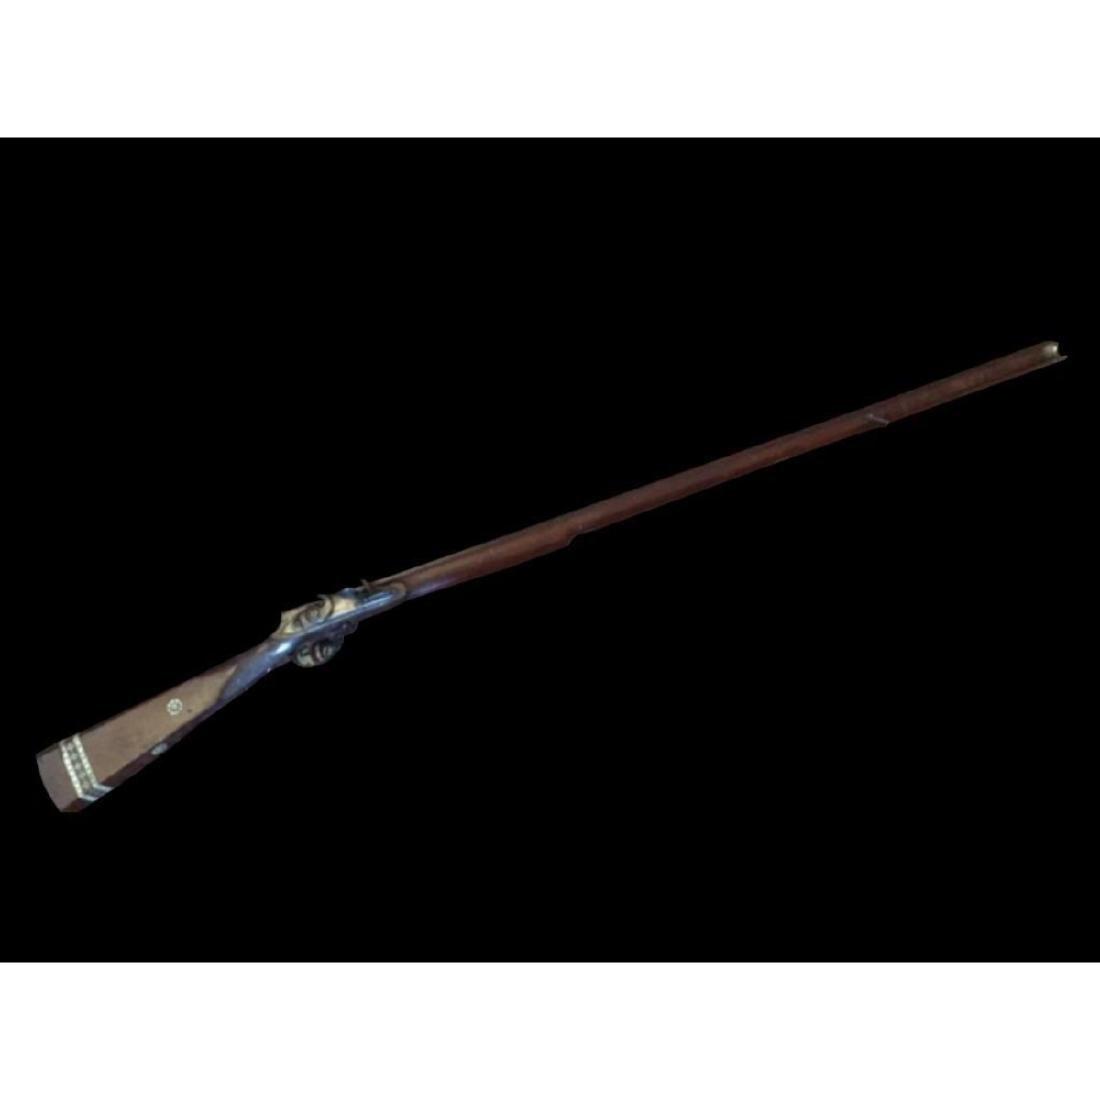 c1790 .700 Flintlock Rifle